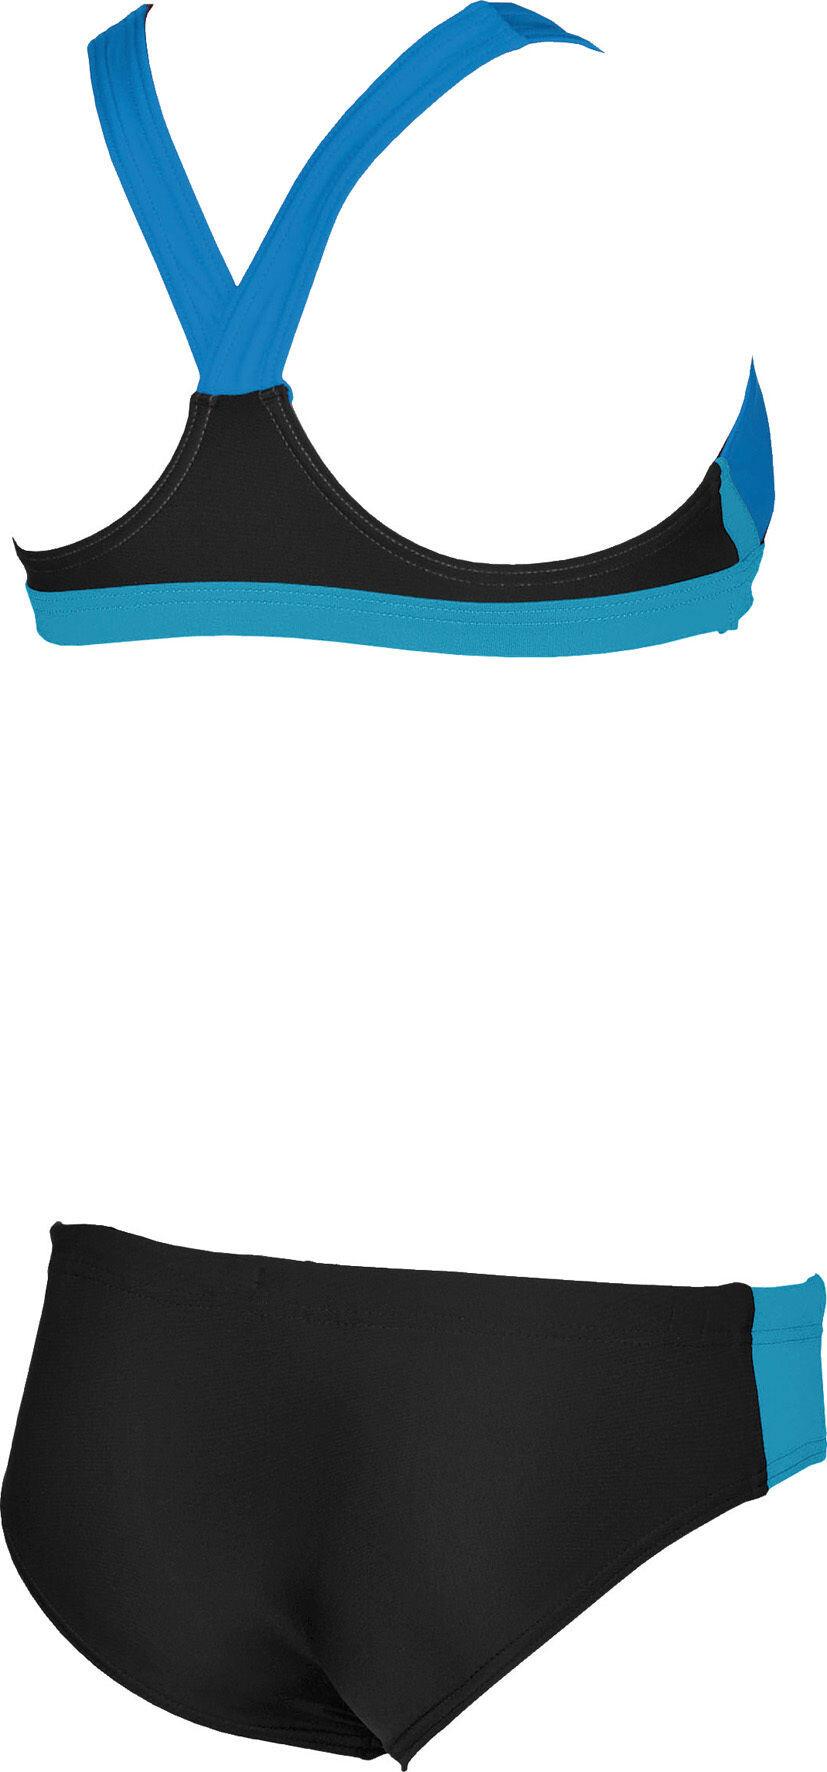 24cb66c9c09 arena Ren bikini Meisjes, black-pix blue-turquoise l Online outdoor ...